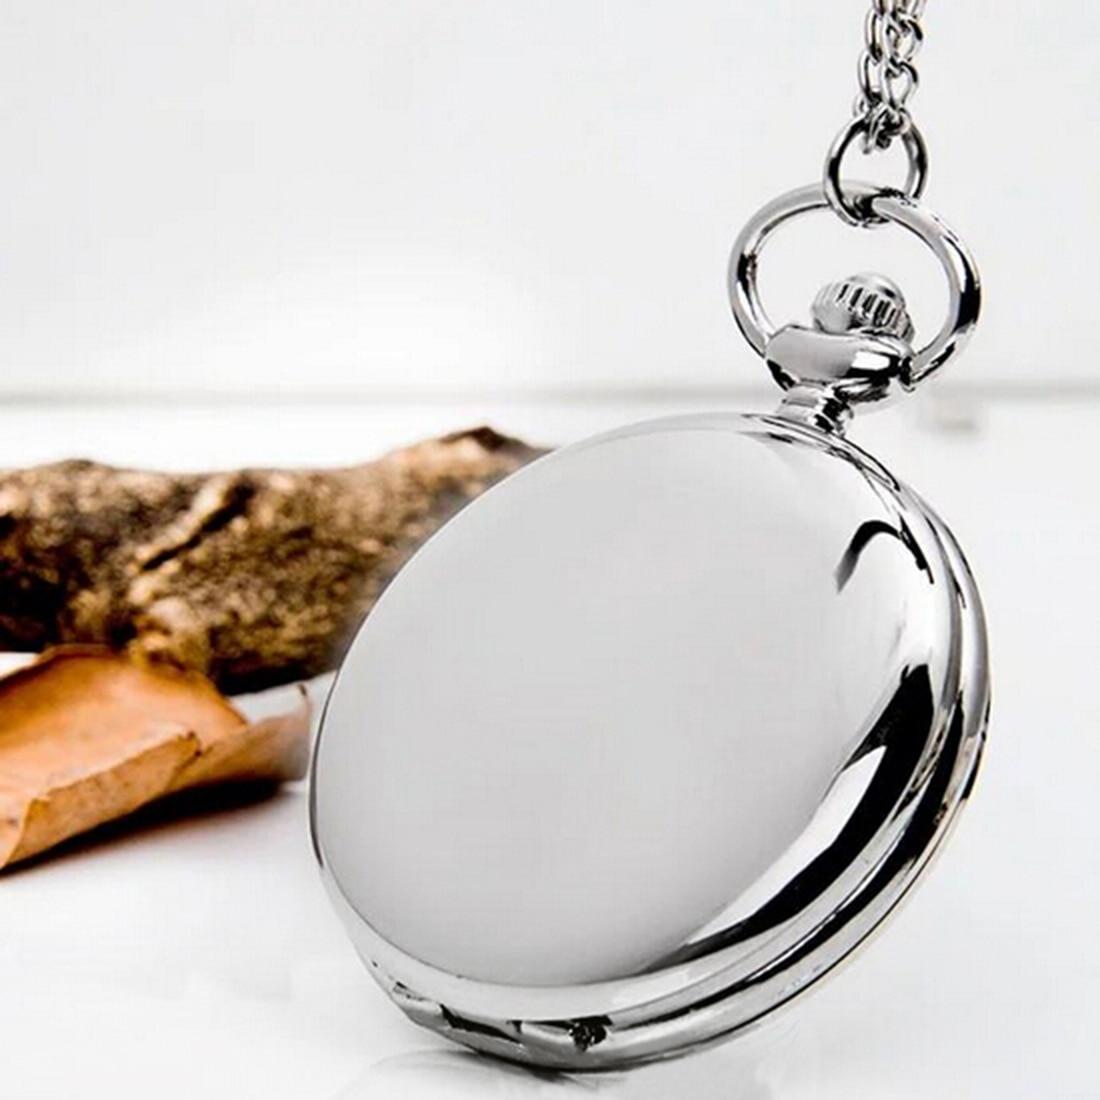 Cindiry Classical 4 5cm Size Silver Polish Quartz Men Pocket Watch Necklace Relogio Gift Quartz Watch